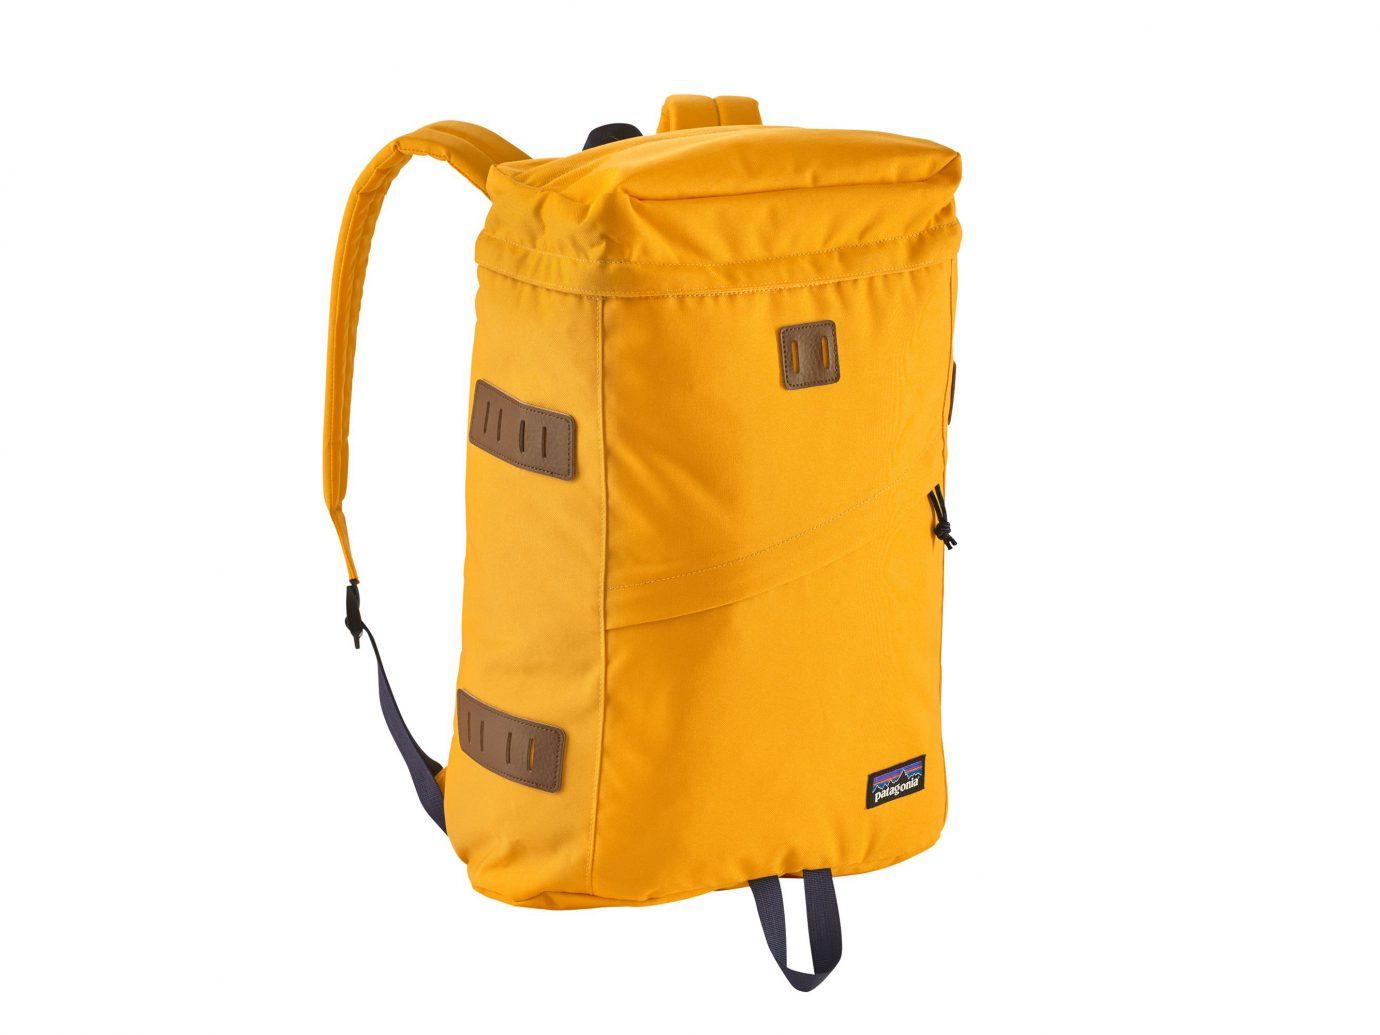 Patagonia Toromiro Backpack